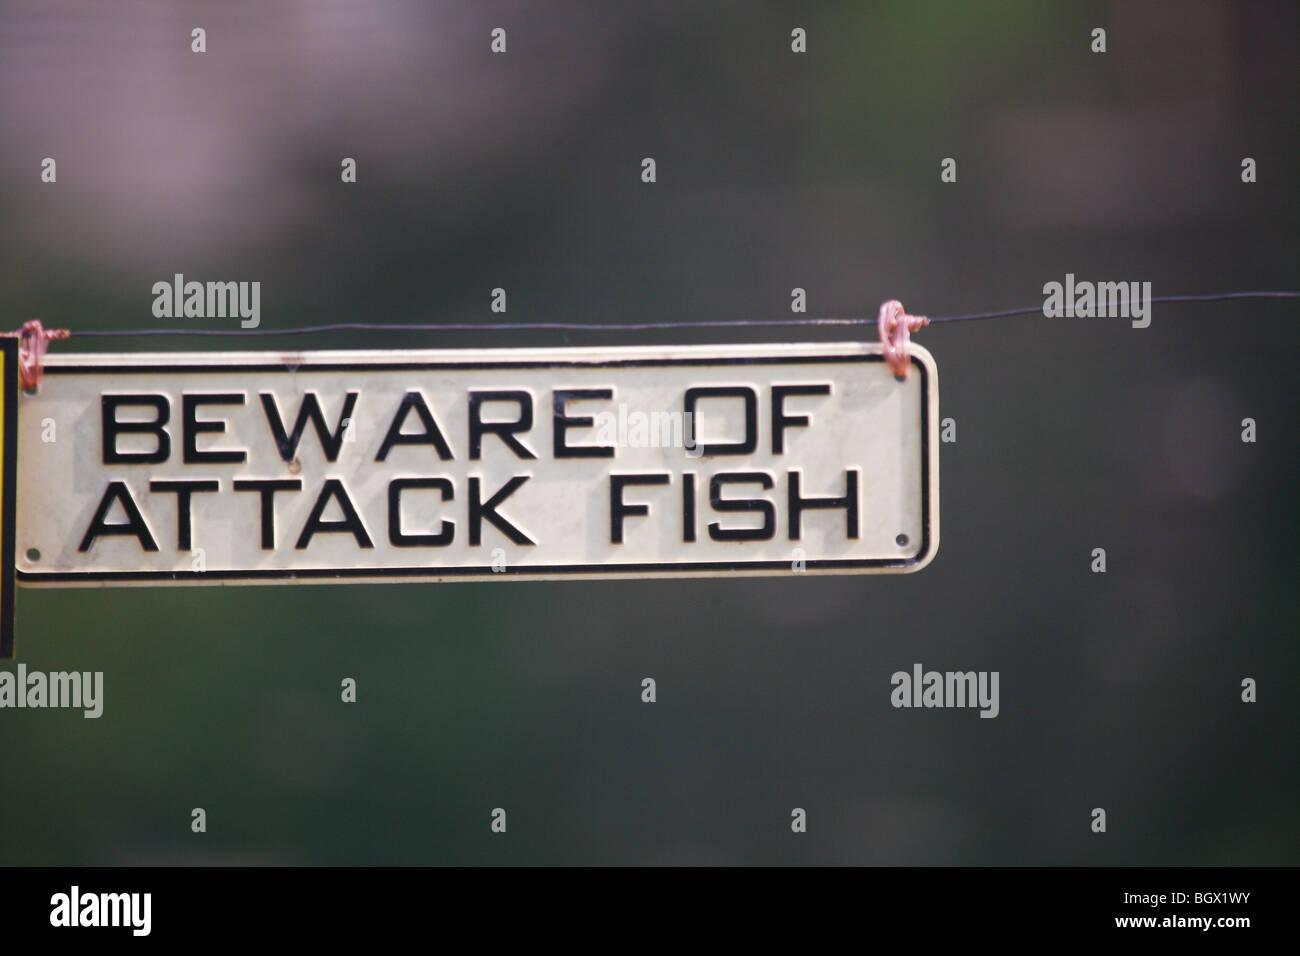 Beware of Attack Fish Sign